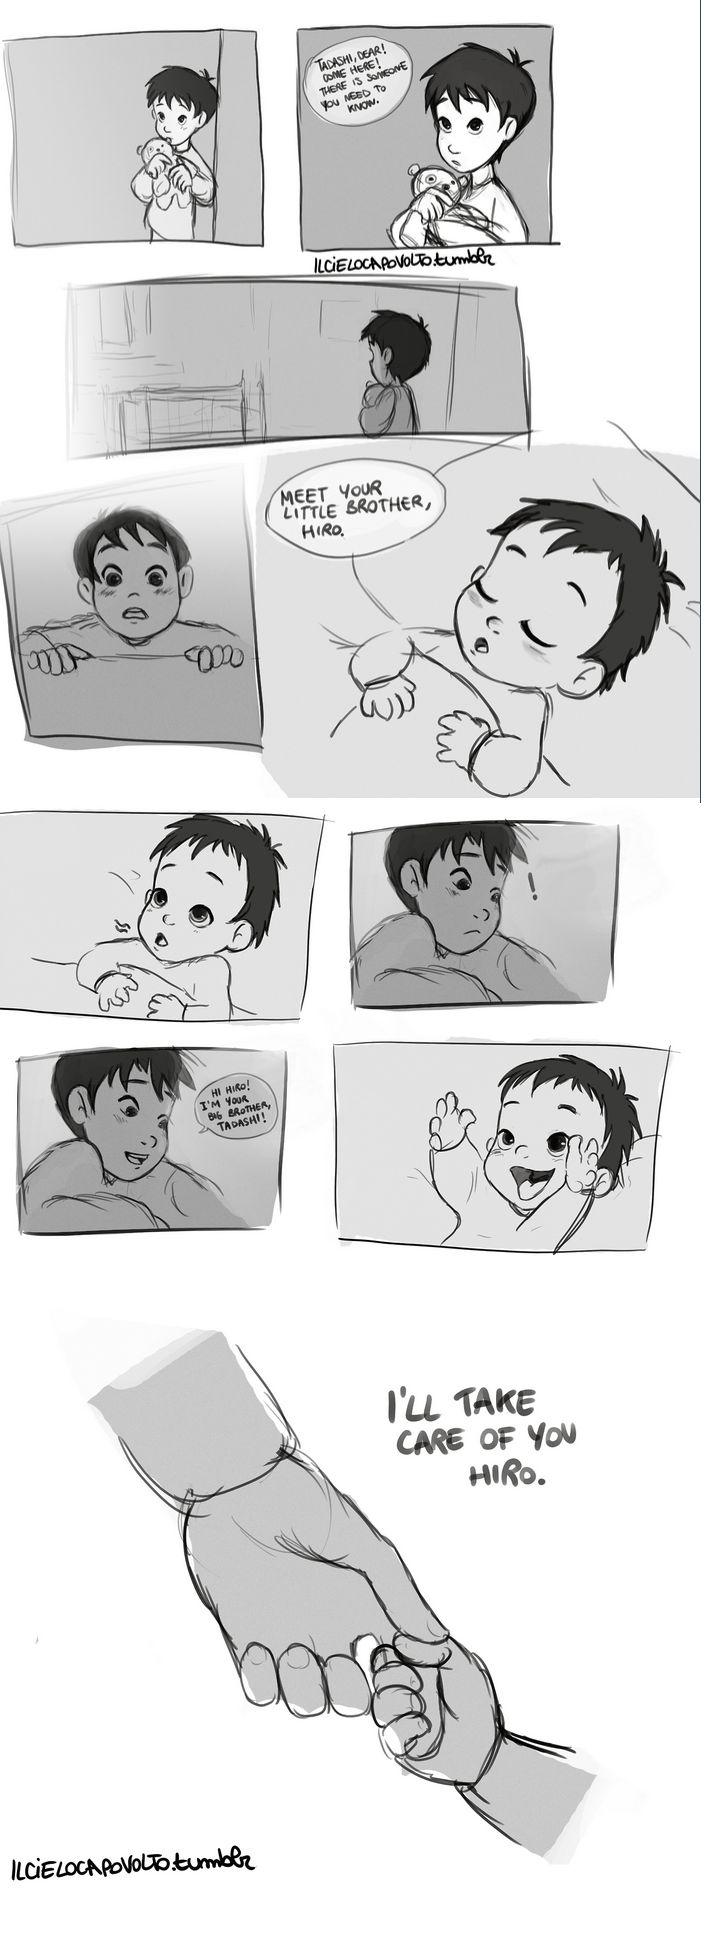 When I first saw Hiro.